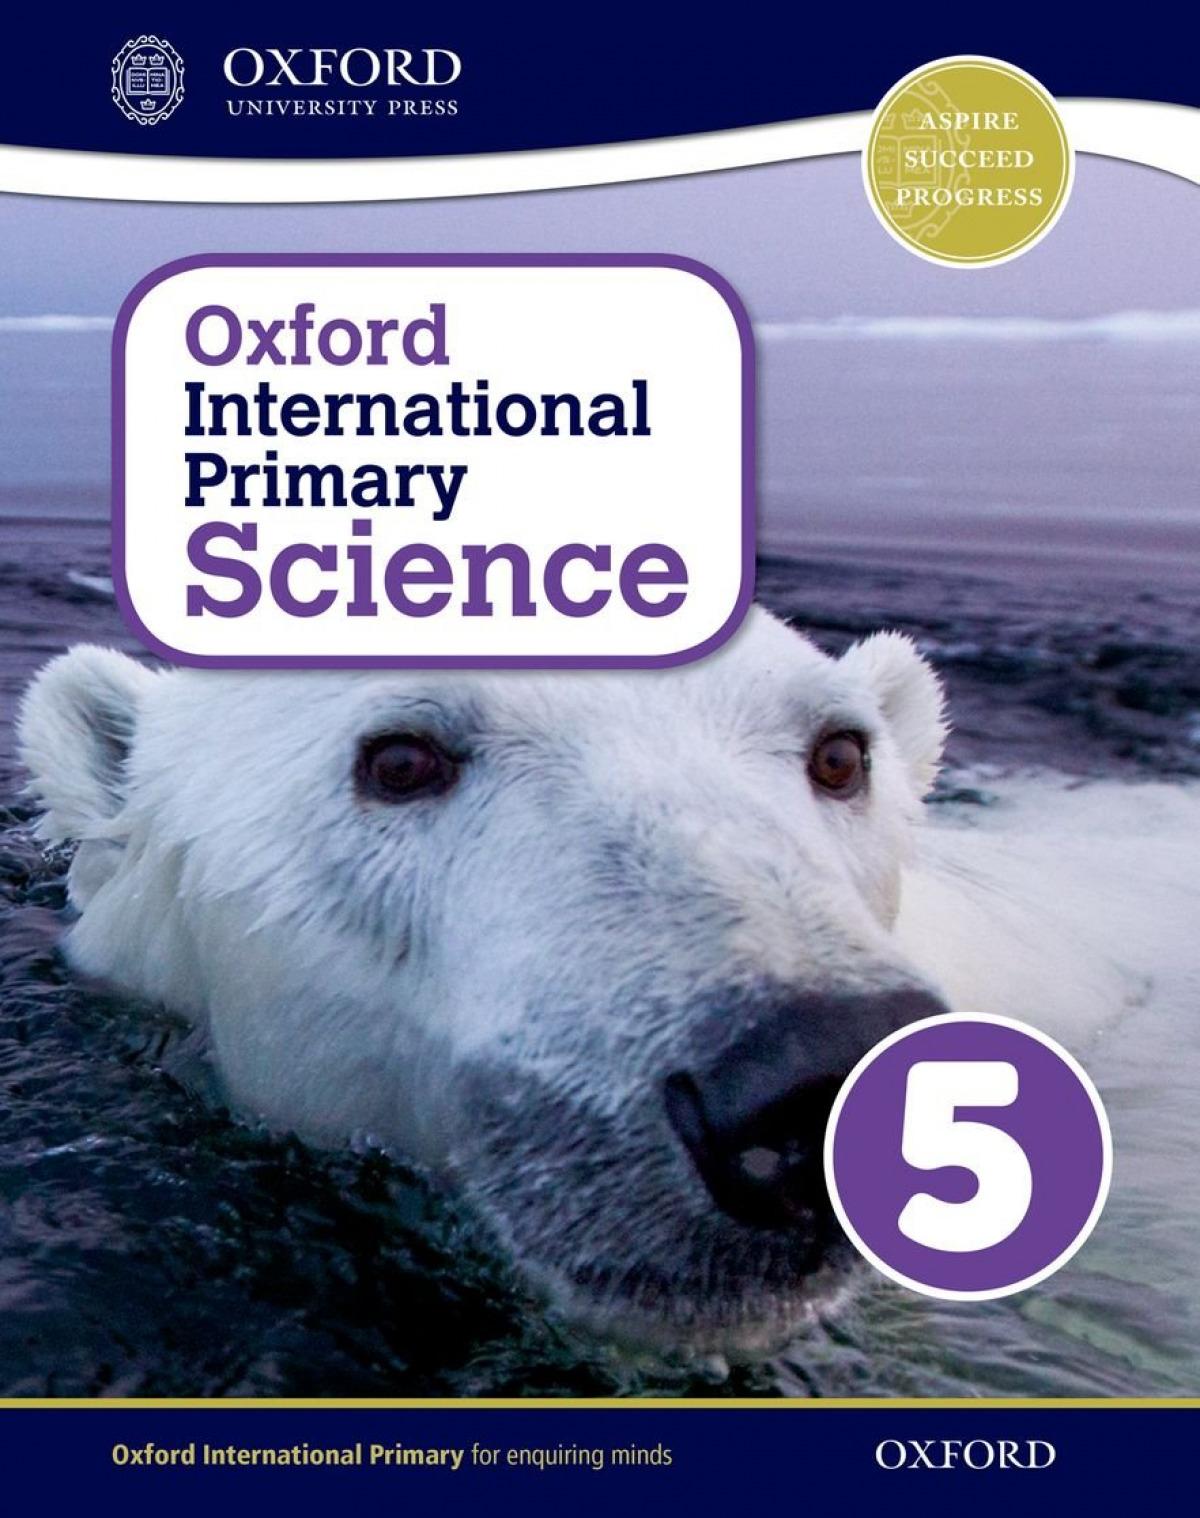 OXFORD INTERN PRIMARY SCIENCE 9/10 WB